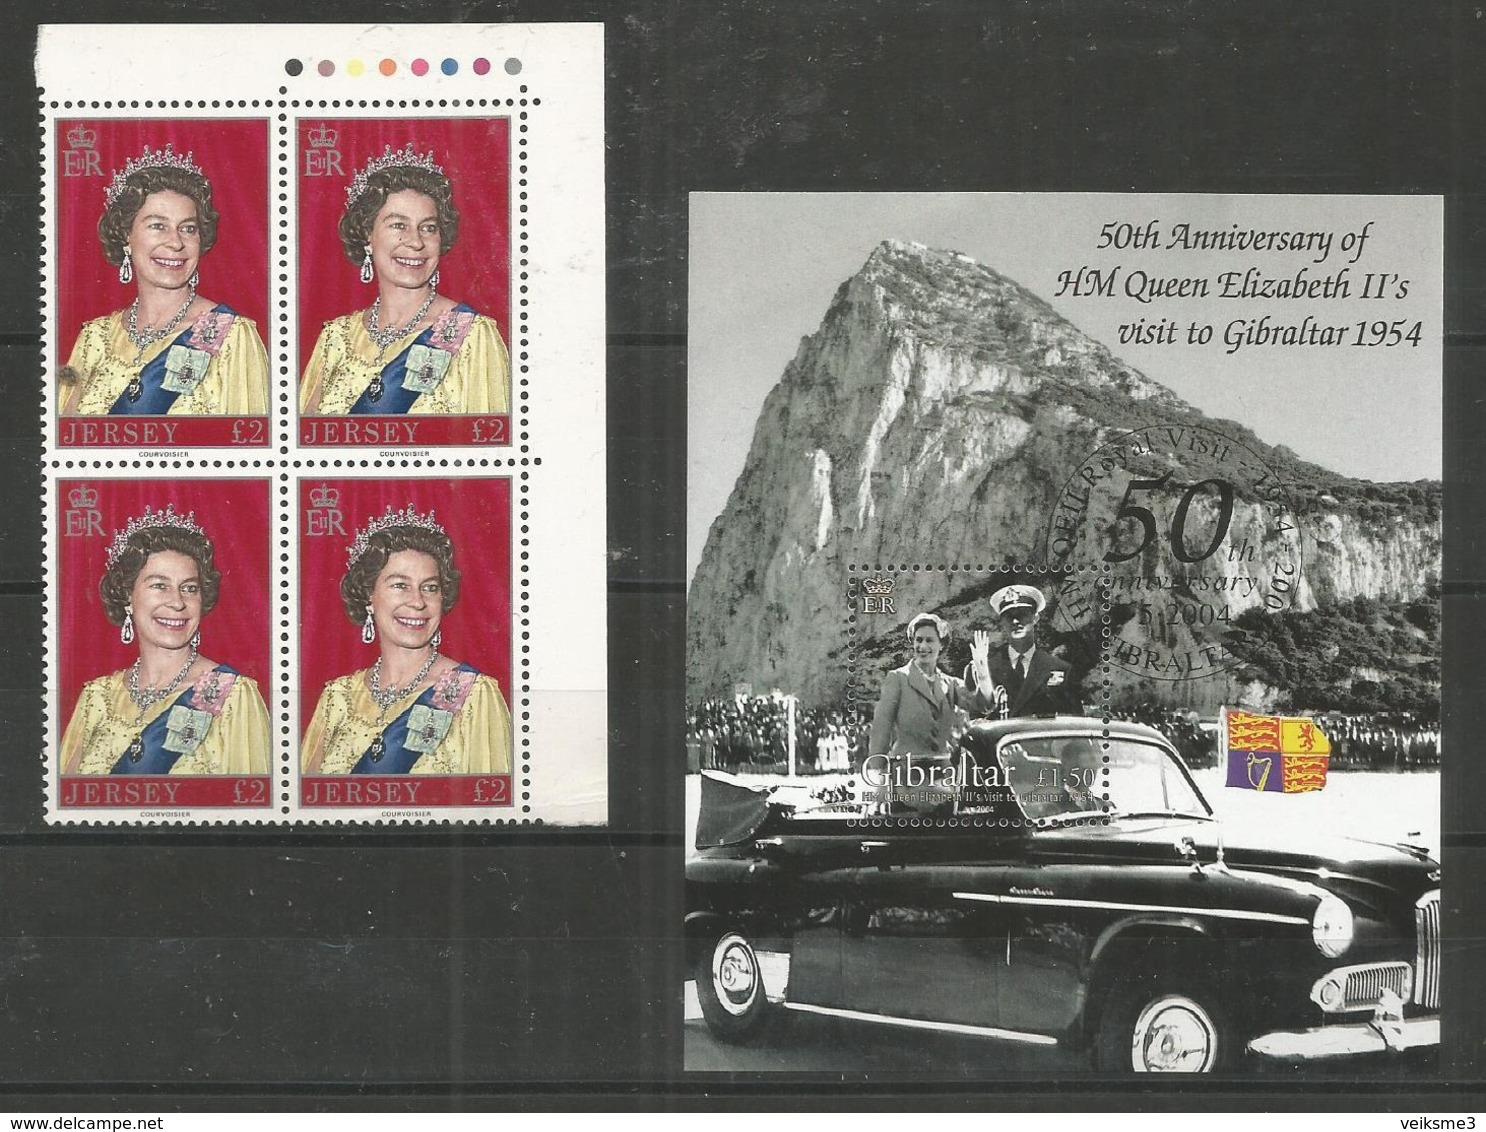 2 Pcs JERSEY - GIBRALTAR - MNH - Famous People - Elizabeth II - Celebridades